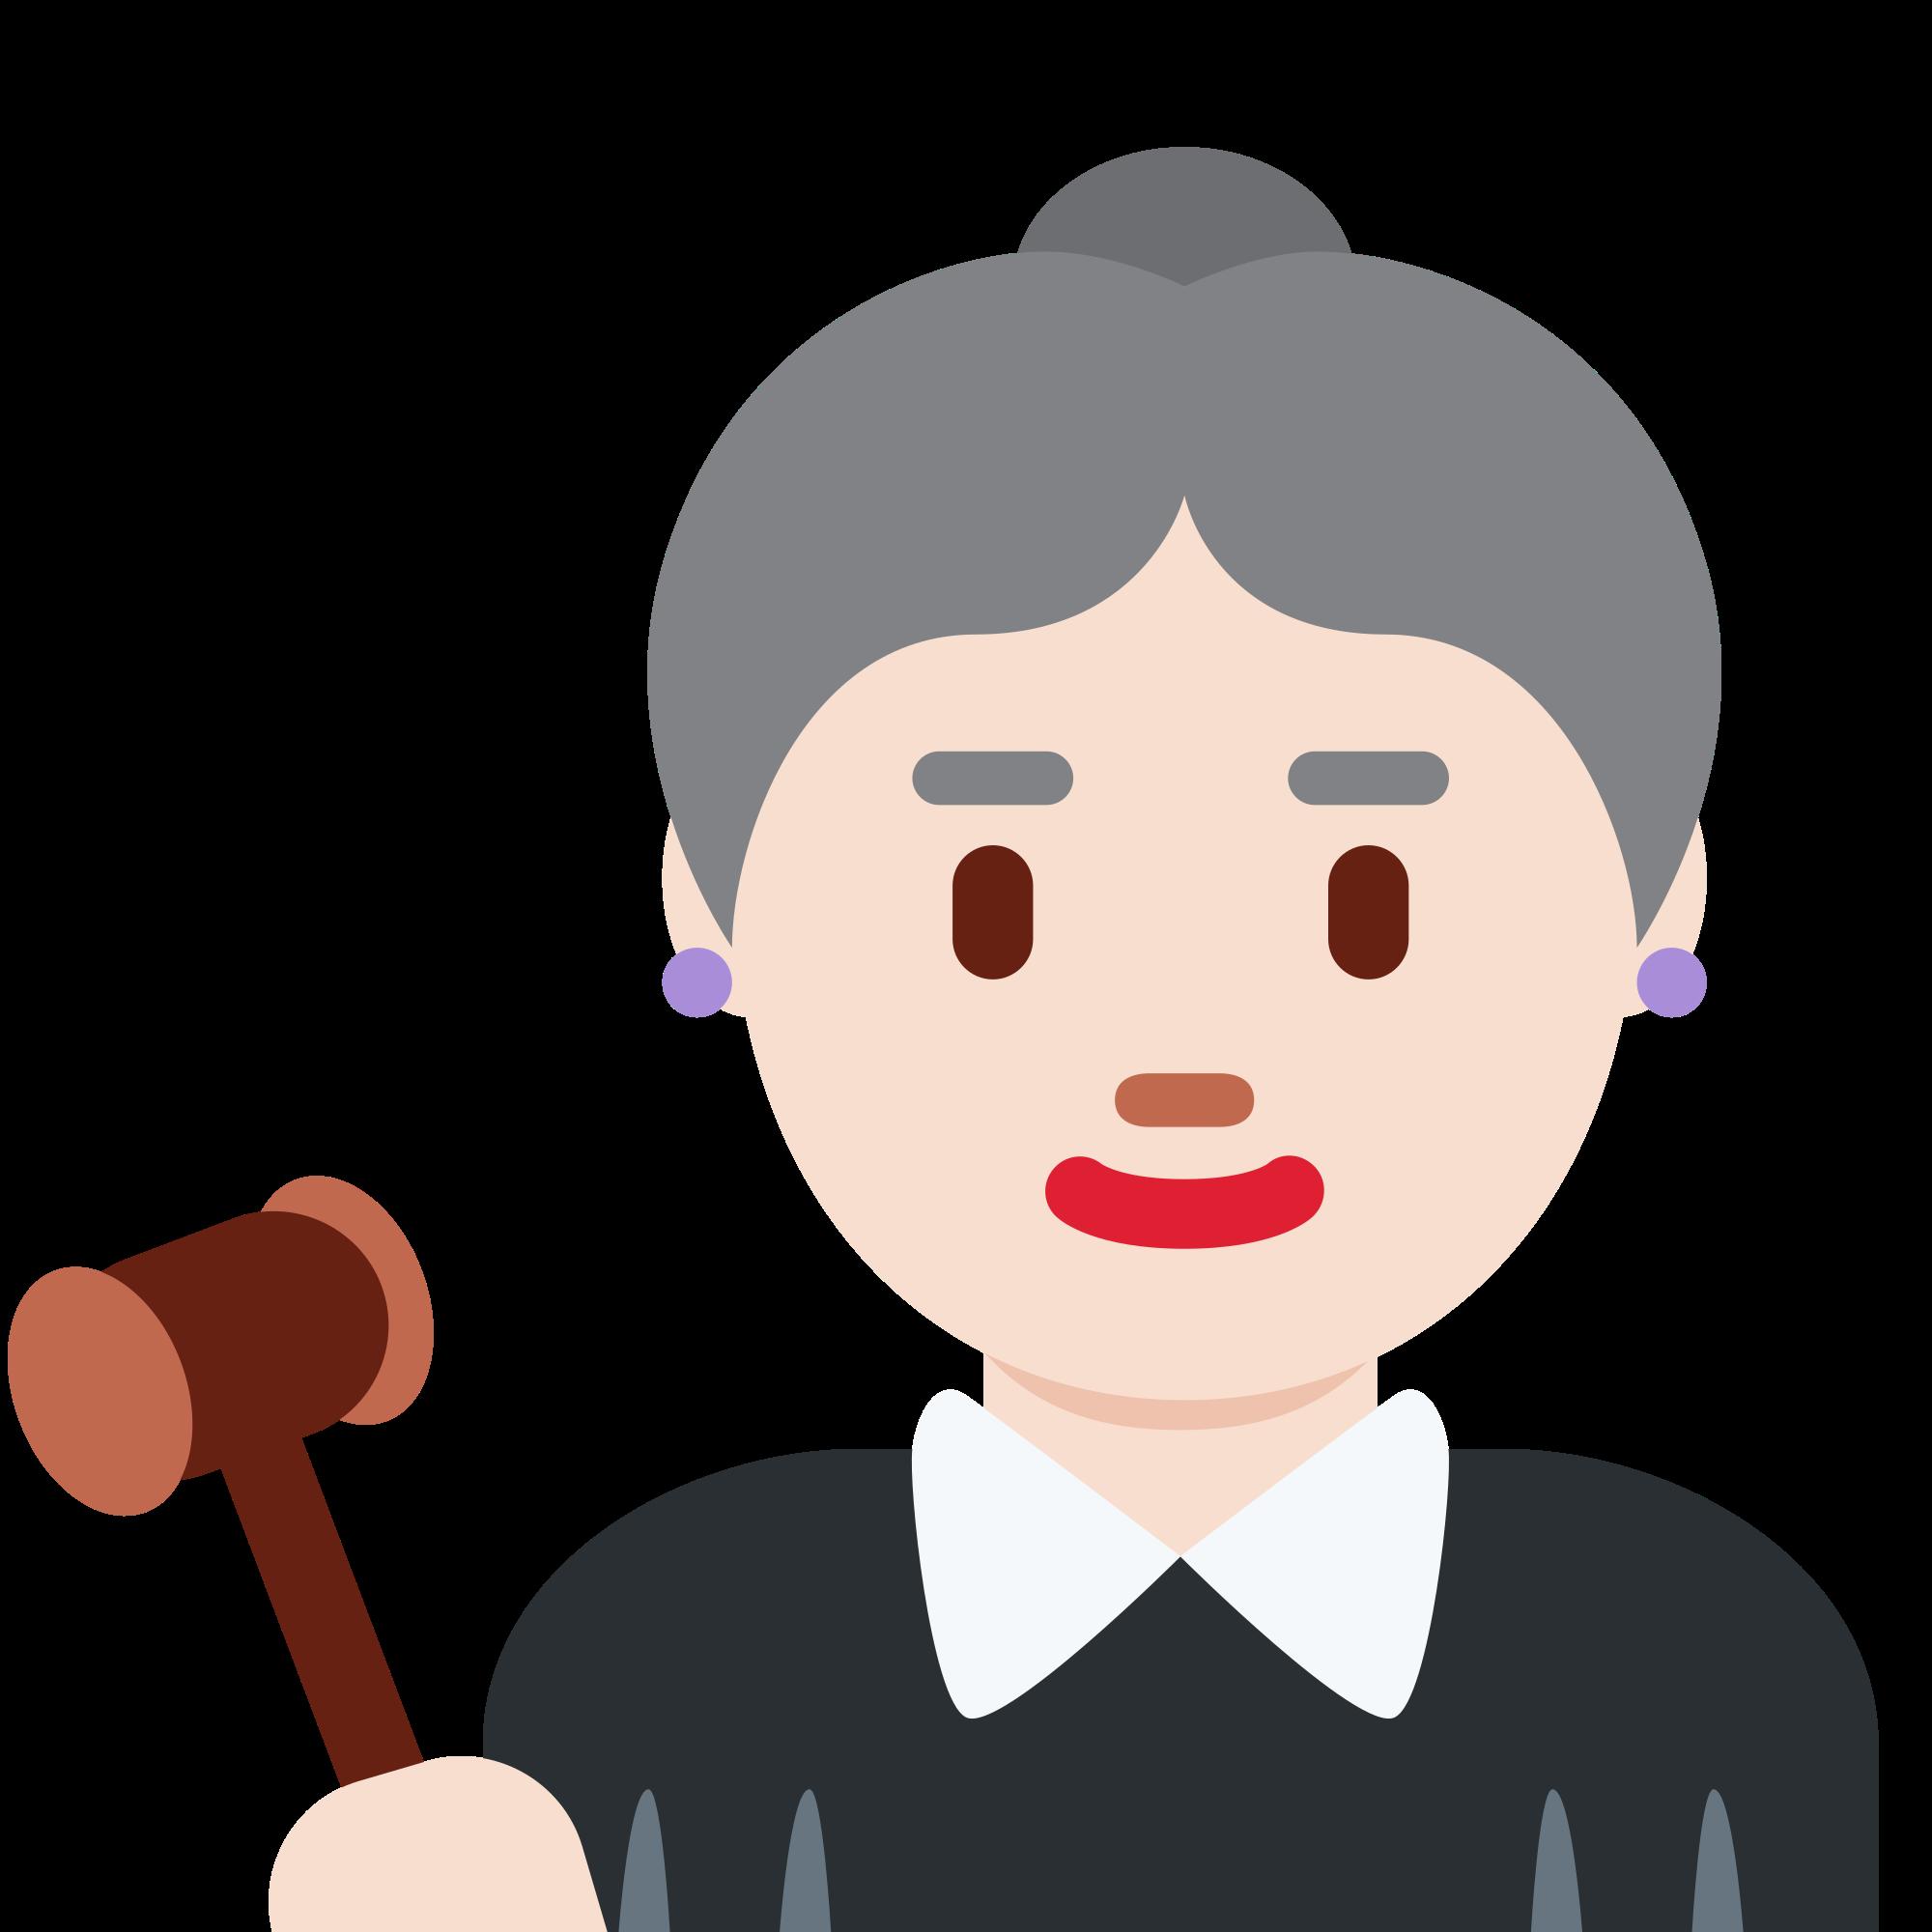 Gavel clipart emoji. File twemoji f fb